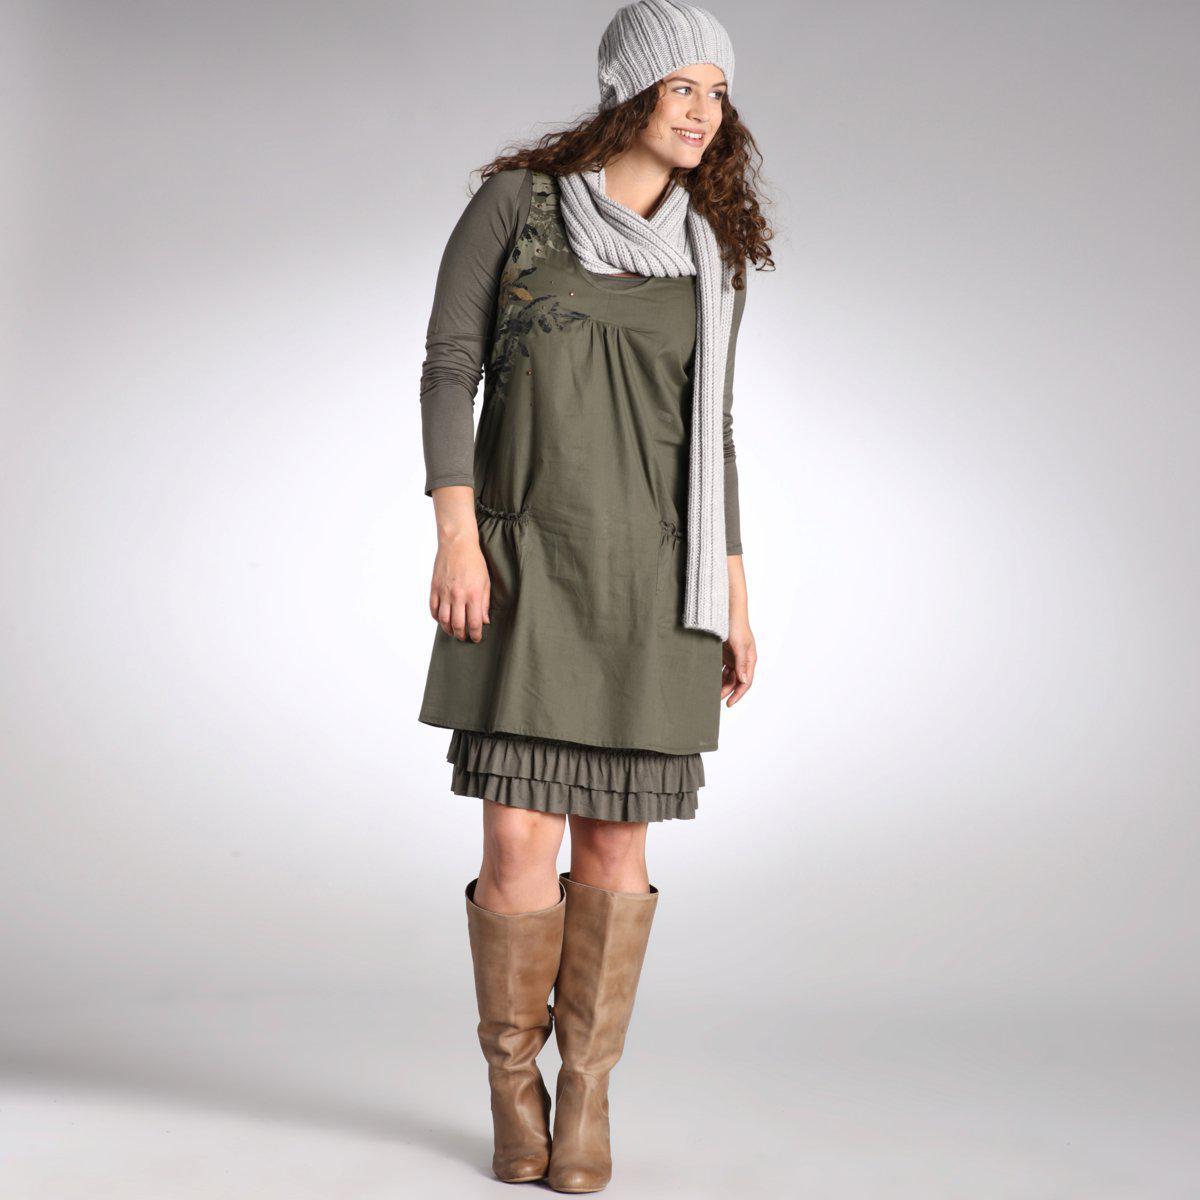 ebe3a26c9d82 Βραδυνα Φορεματα LaRedoute Φθινόπωρο 2011 Κωδ. 324213585